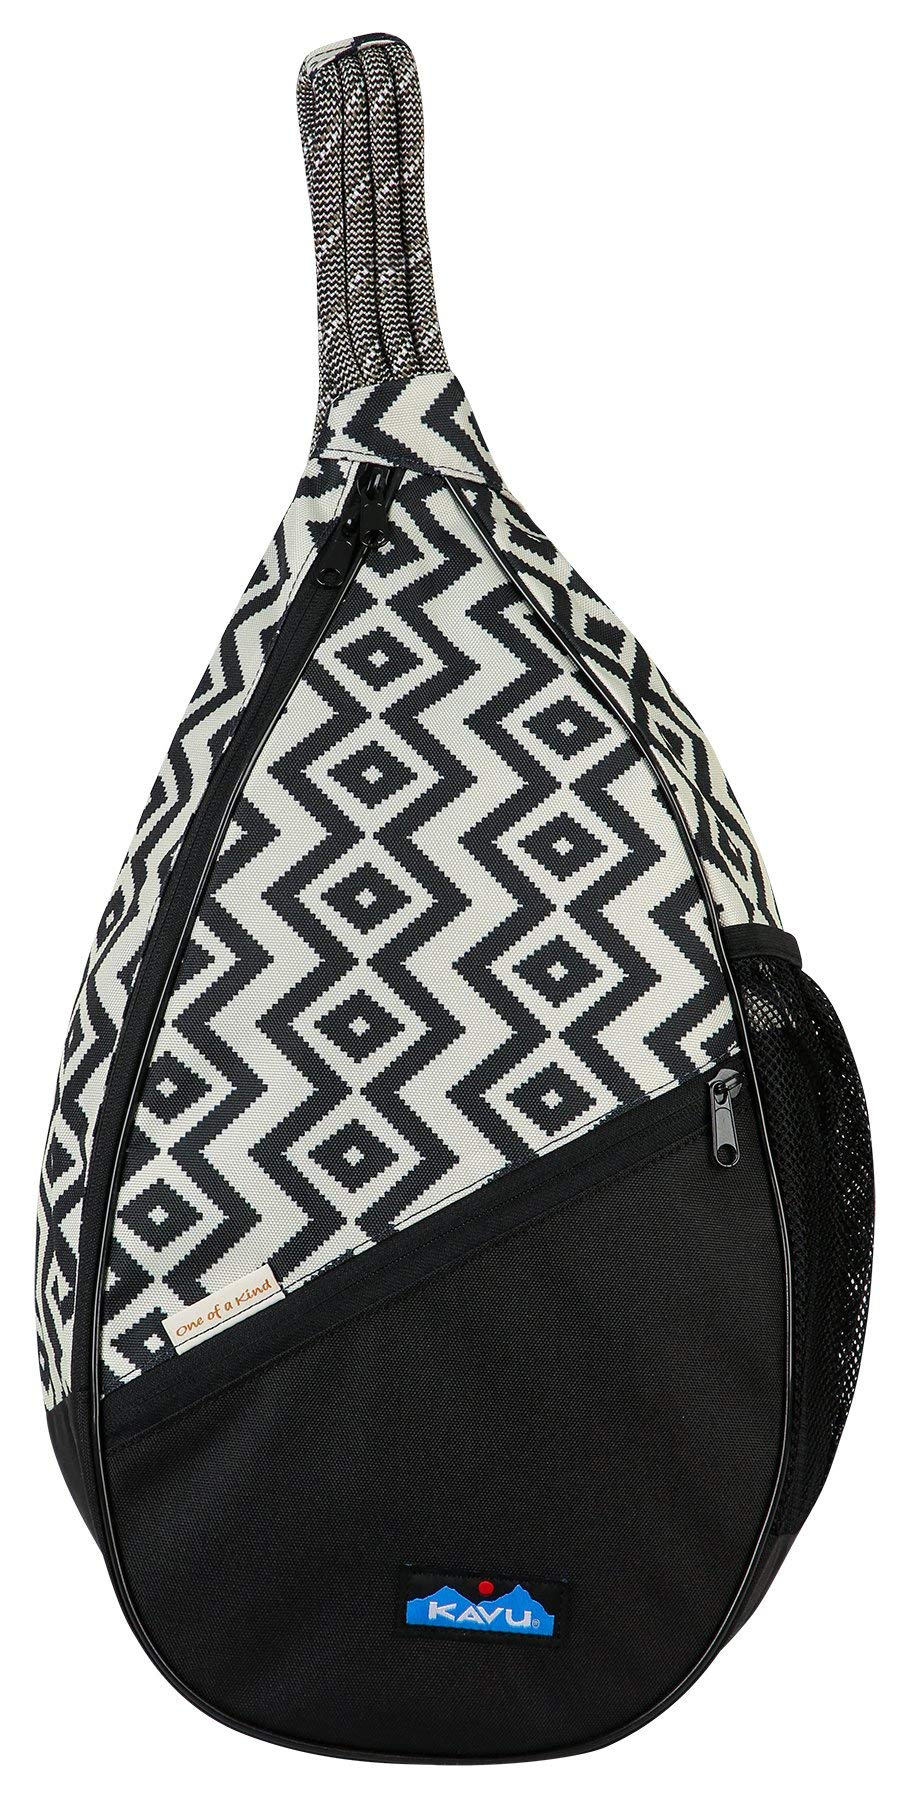 KAVU Paxton Pack Backpack Rope Sling Bag - BW Textile